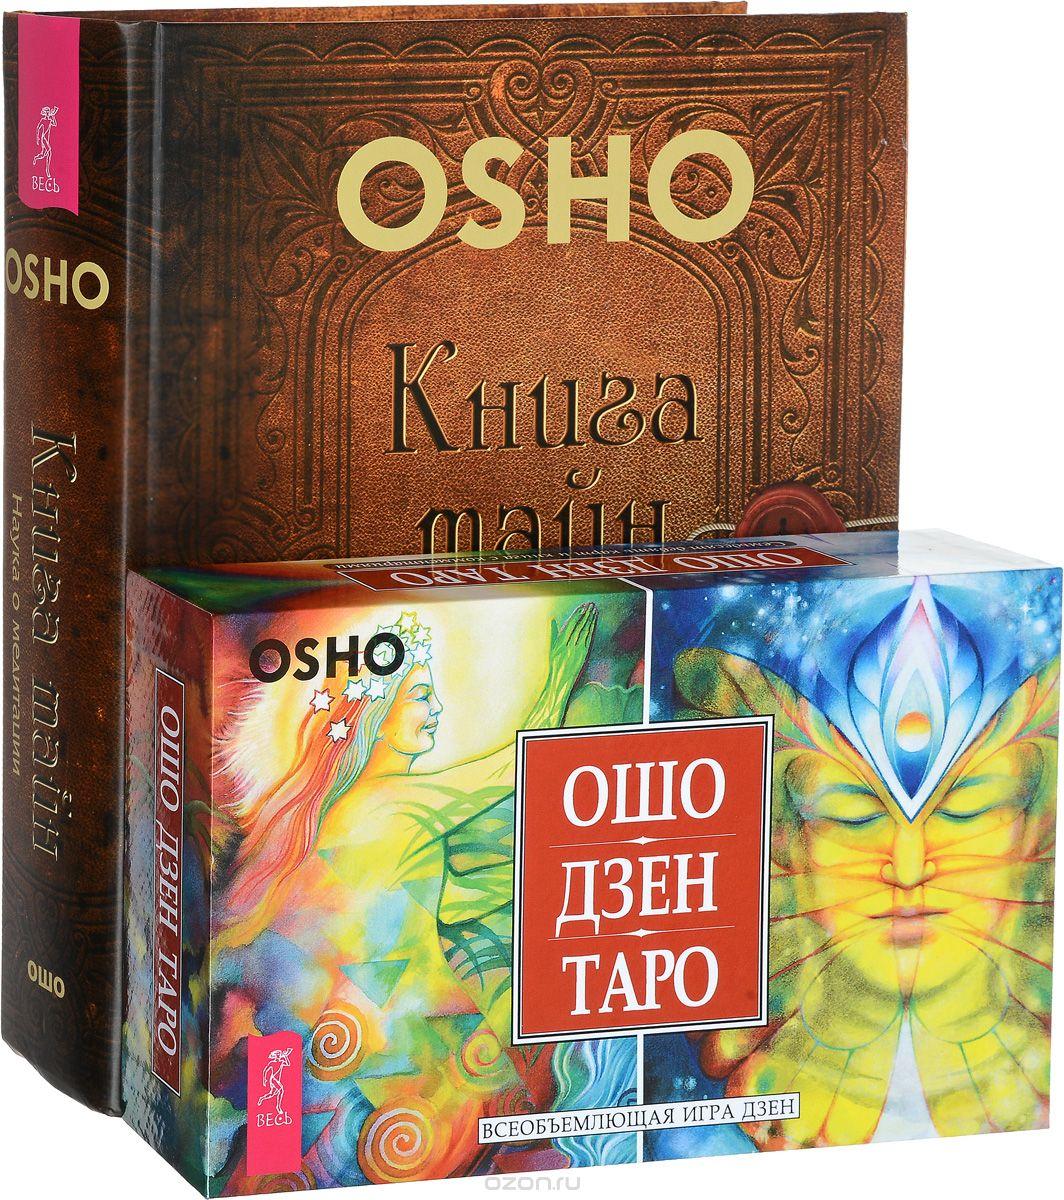 Раджниш Ошо: Ошо Дзен Таро. Книга тайн (комплект из 2 книг + 79 карт)